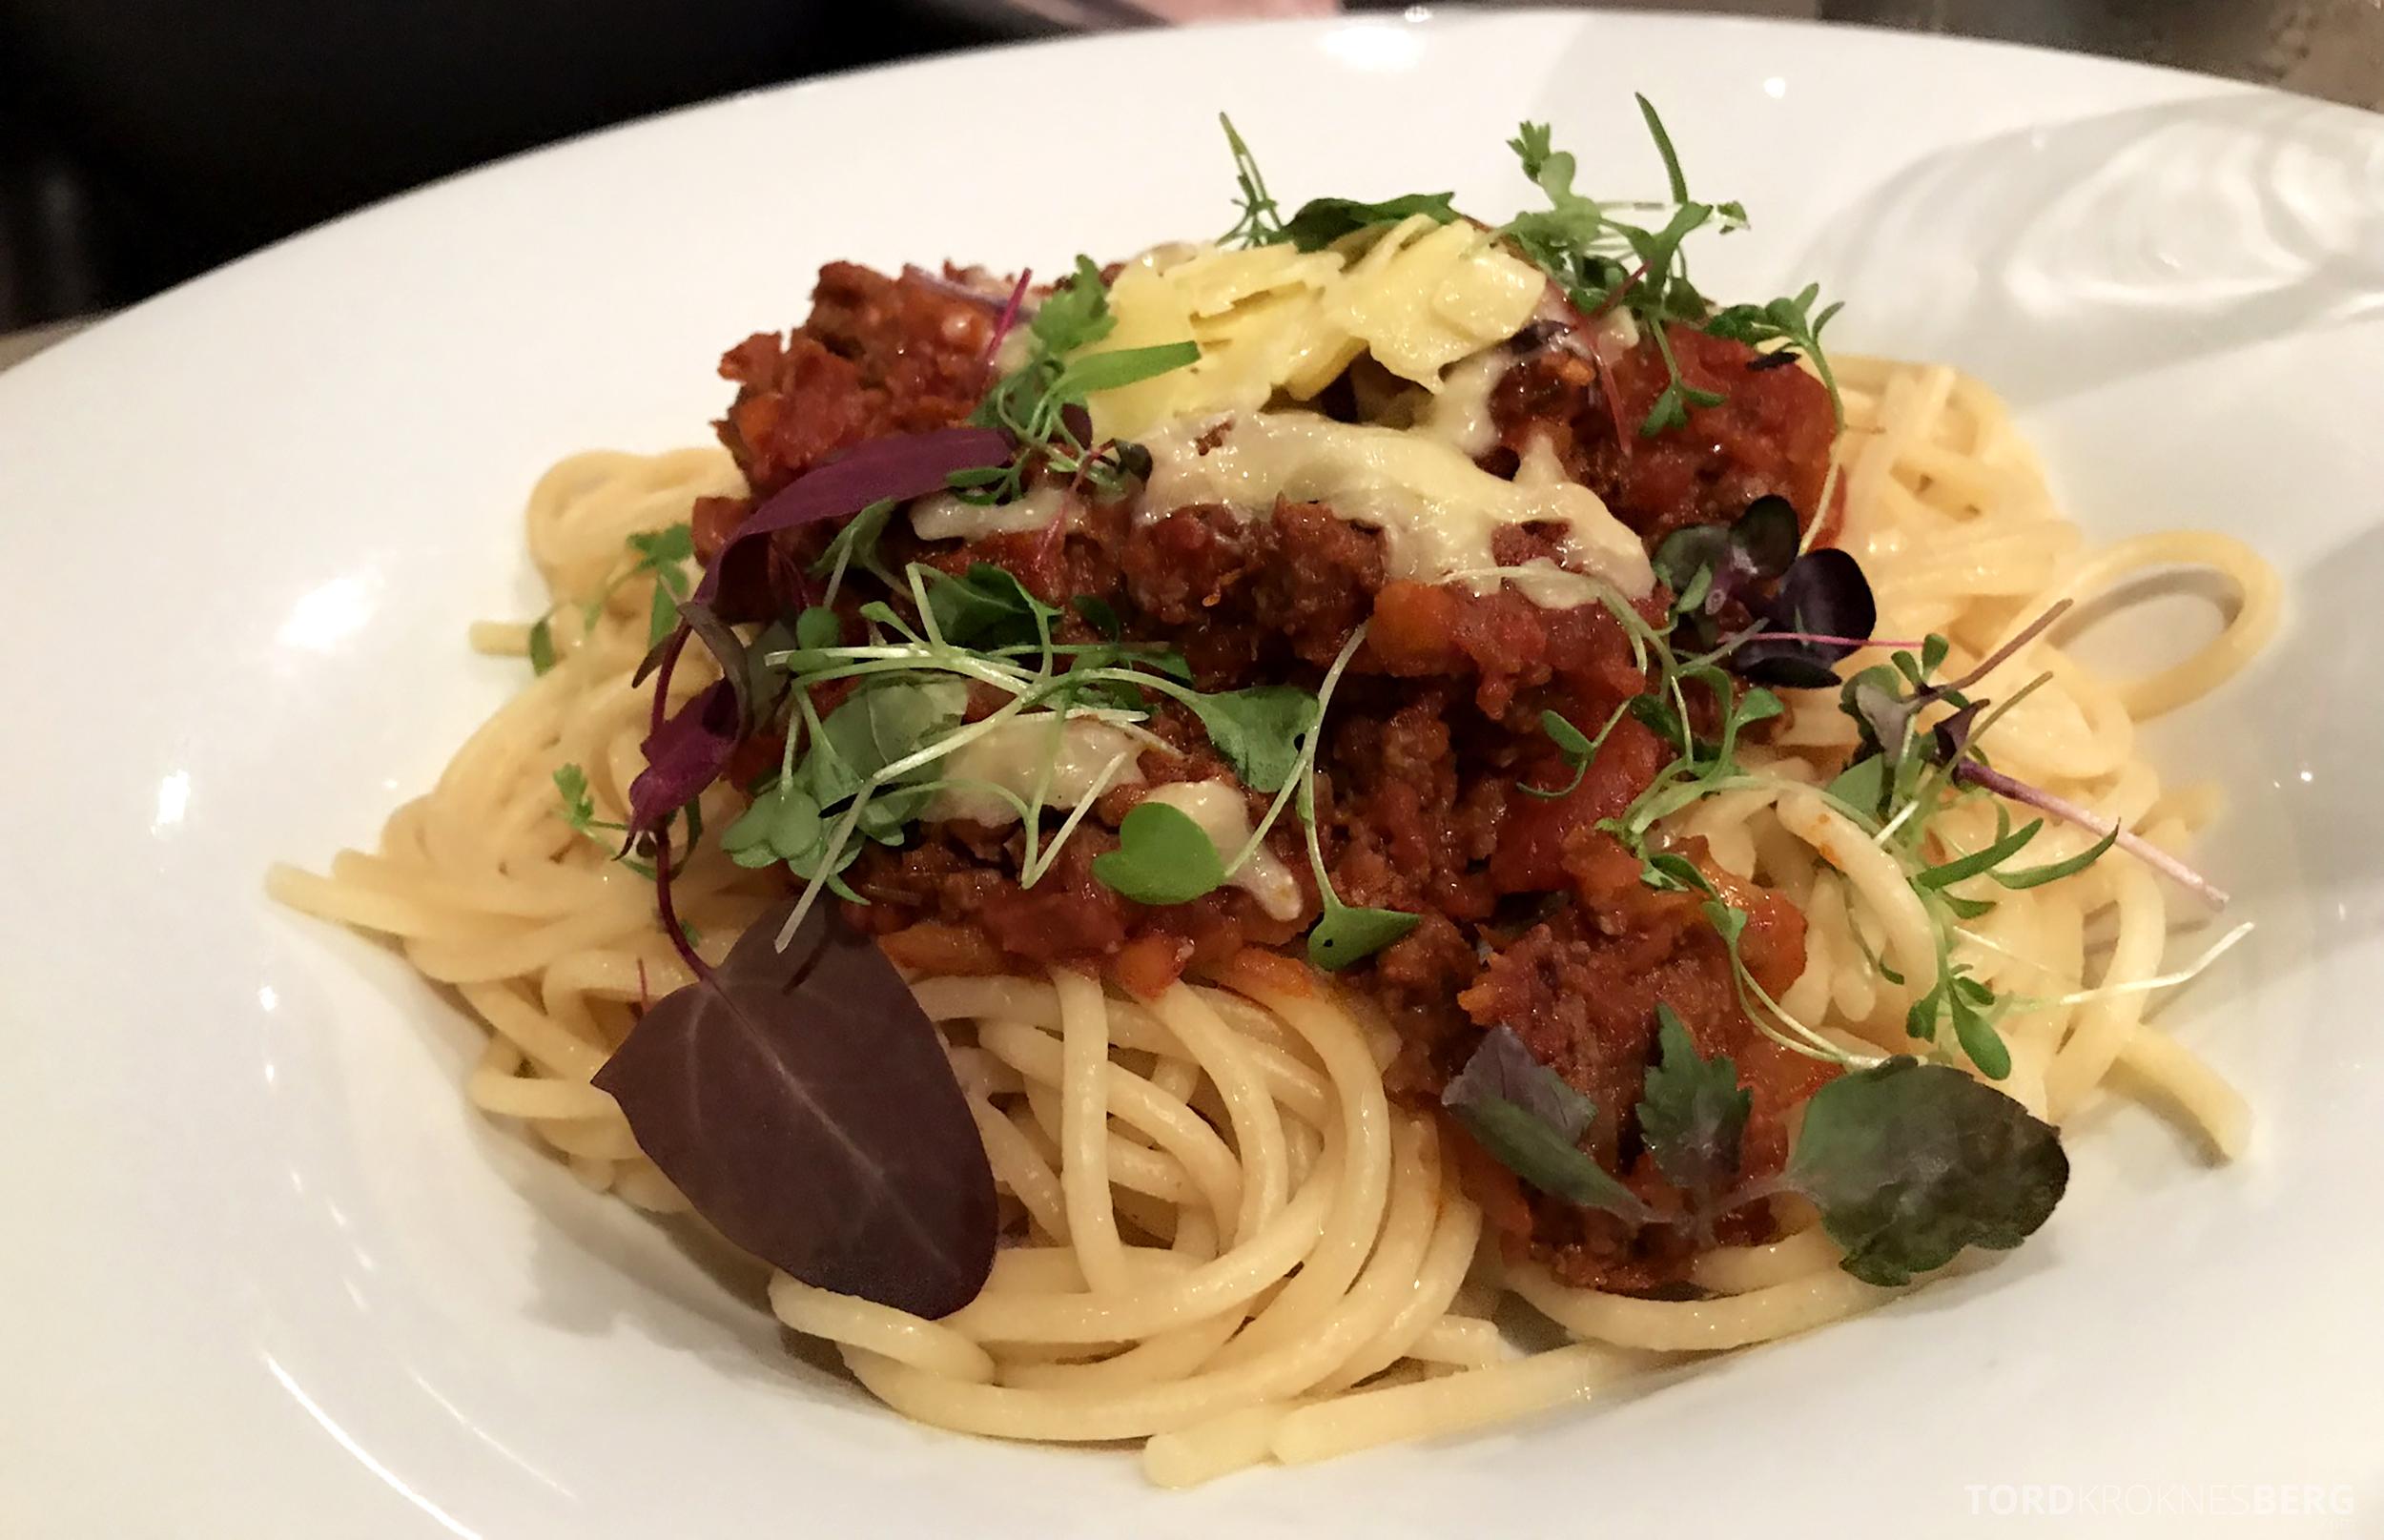 Sofitel Hotel Brisbane pasta room service